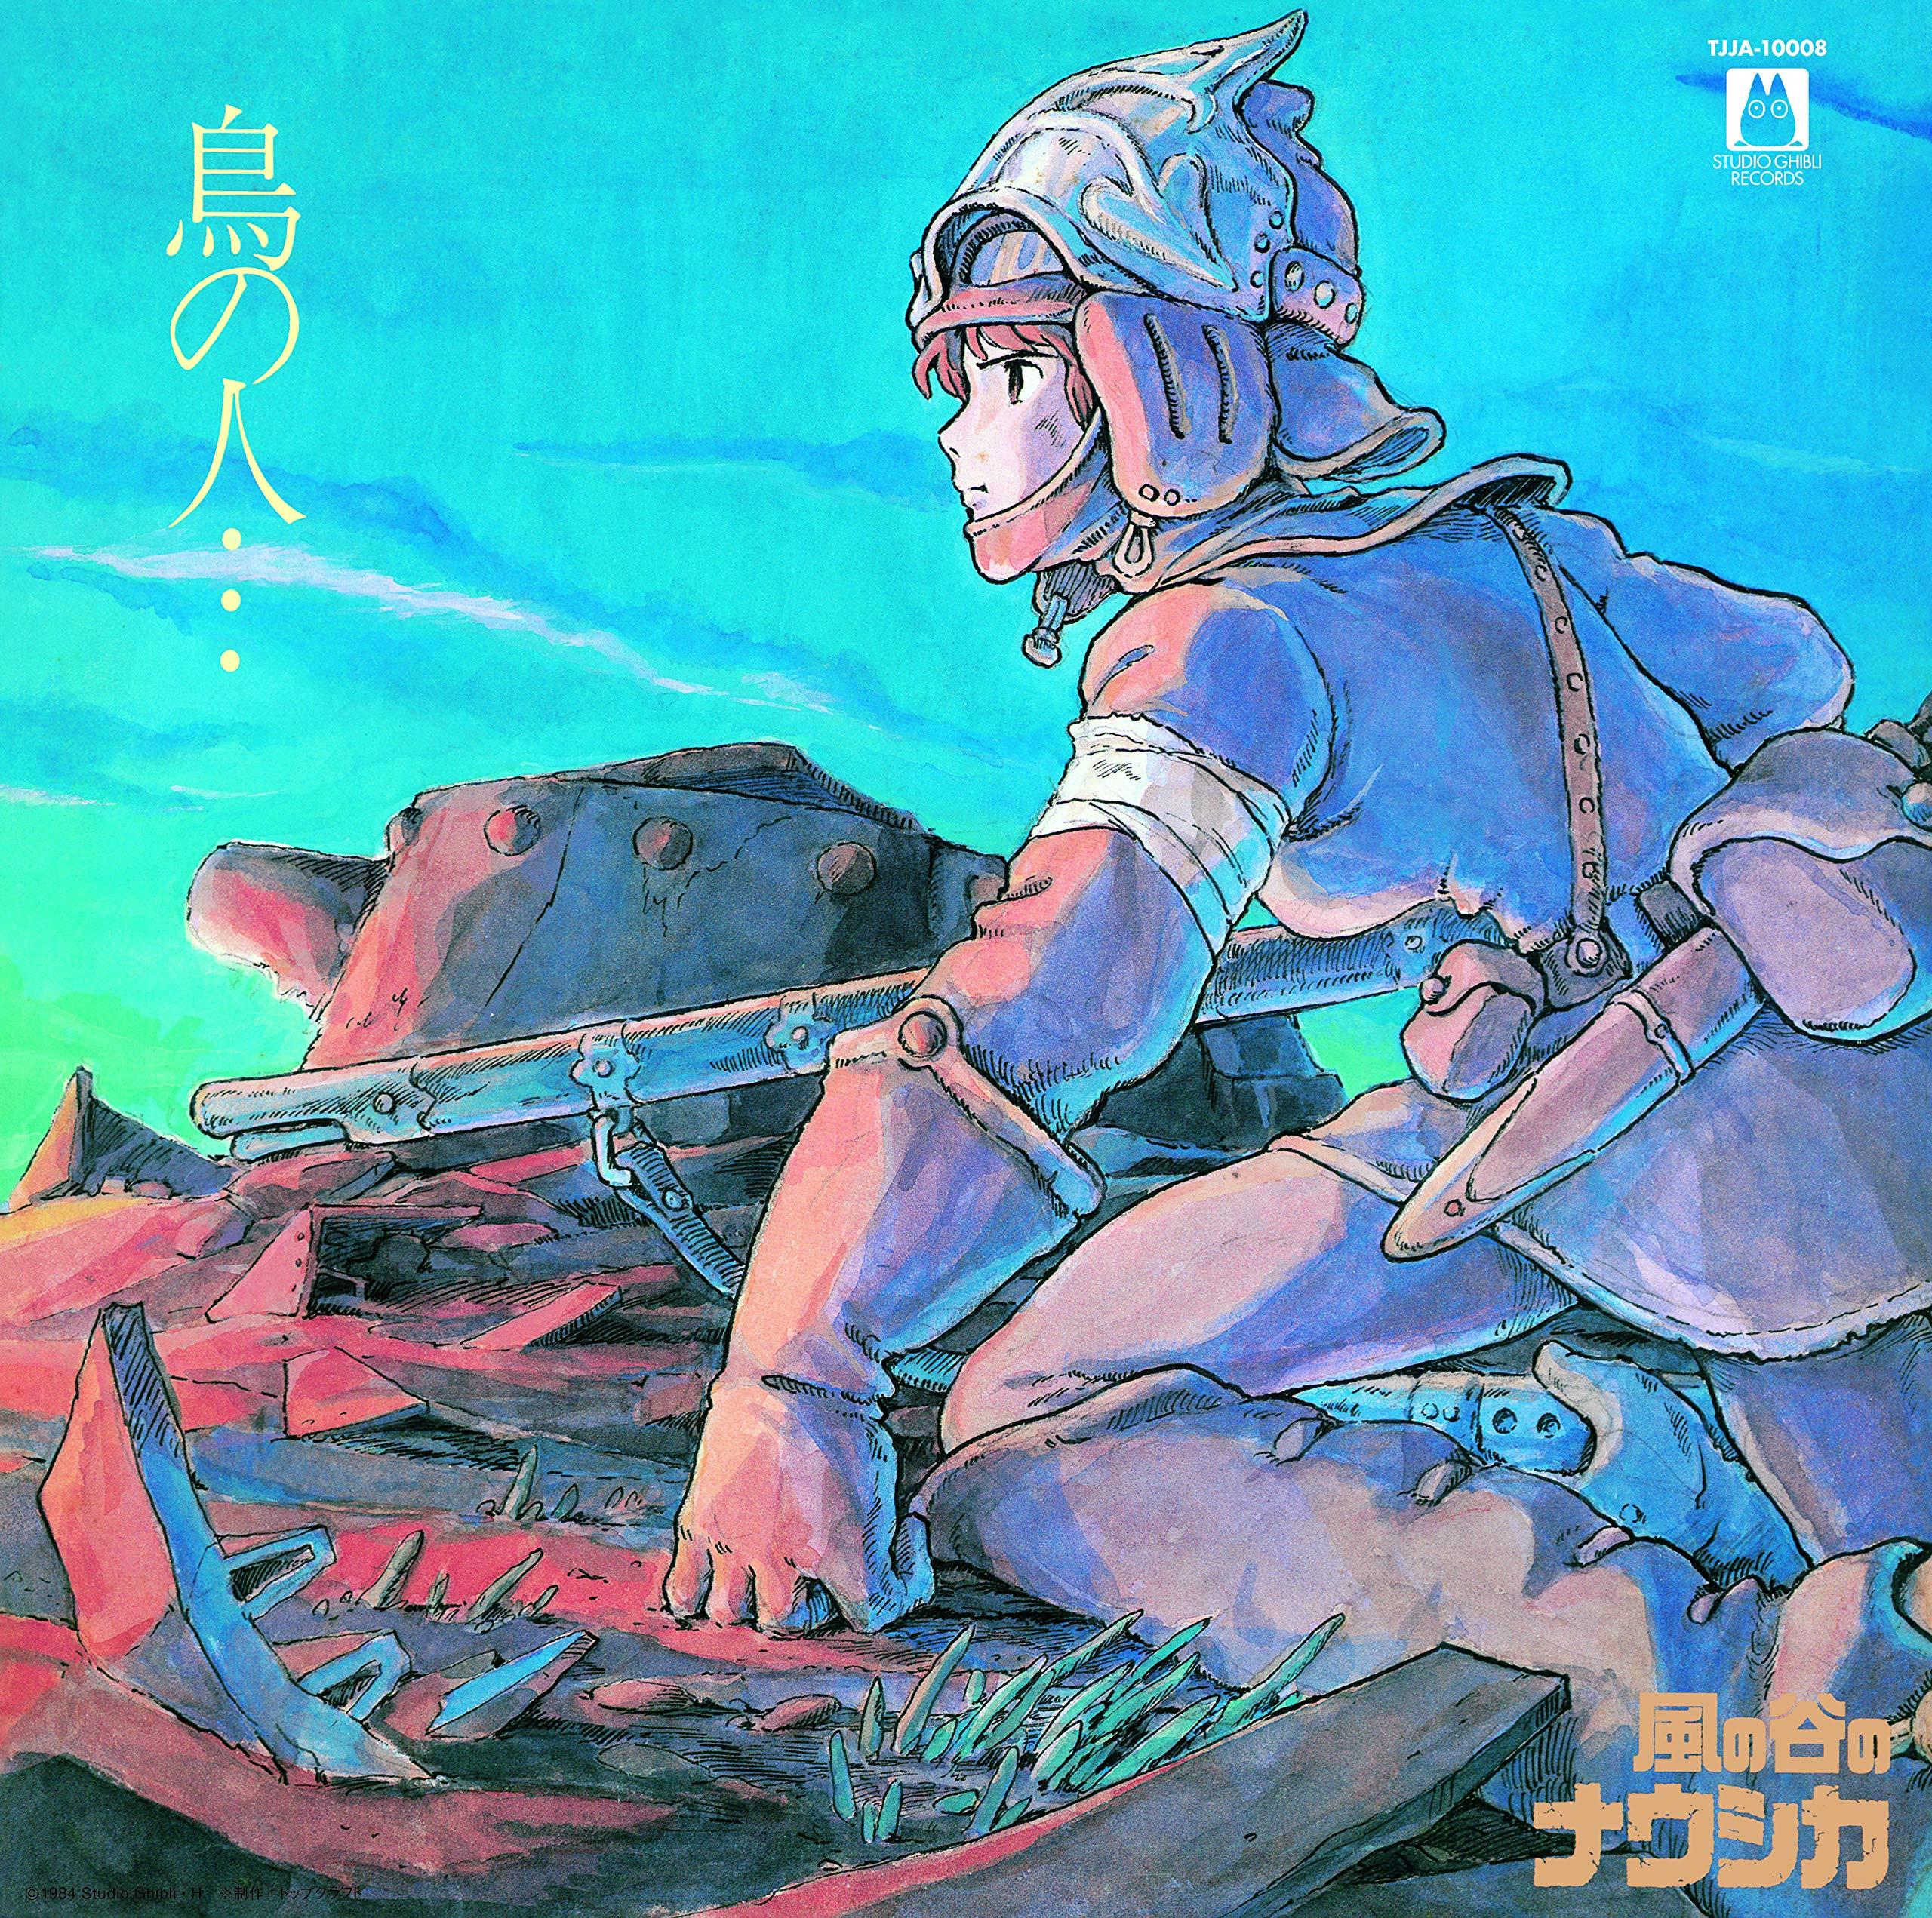 Vinilo : Joe Hisaishi - Nausicaa Of The Valley Of Wind: Image Album (original Soundtrack) (Limited Edition)